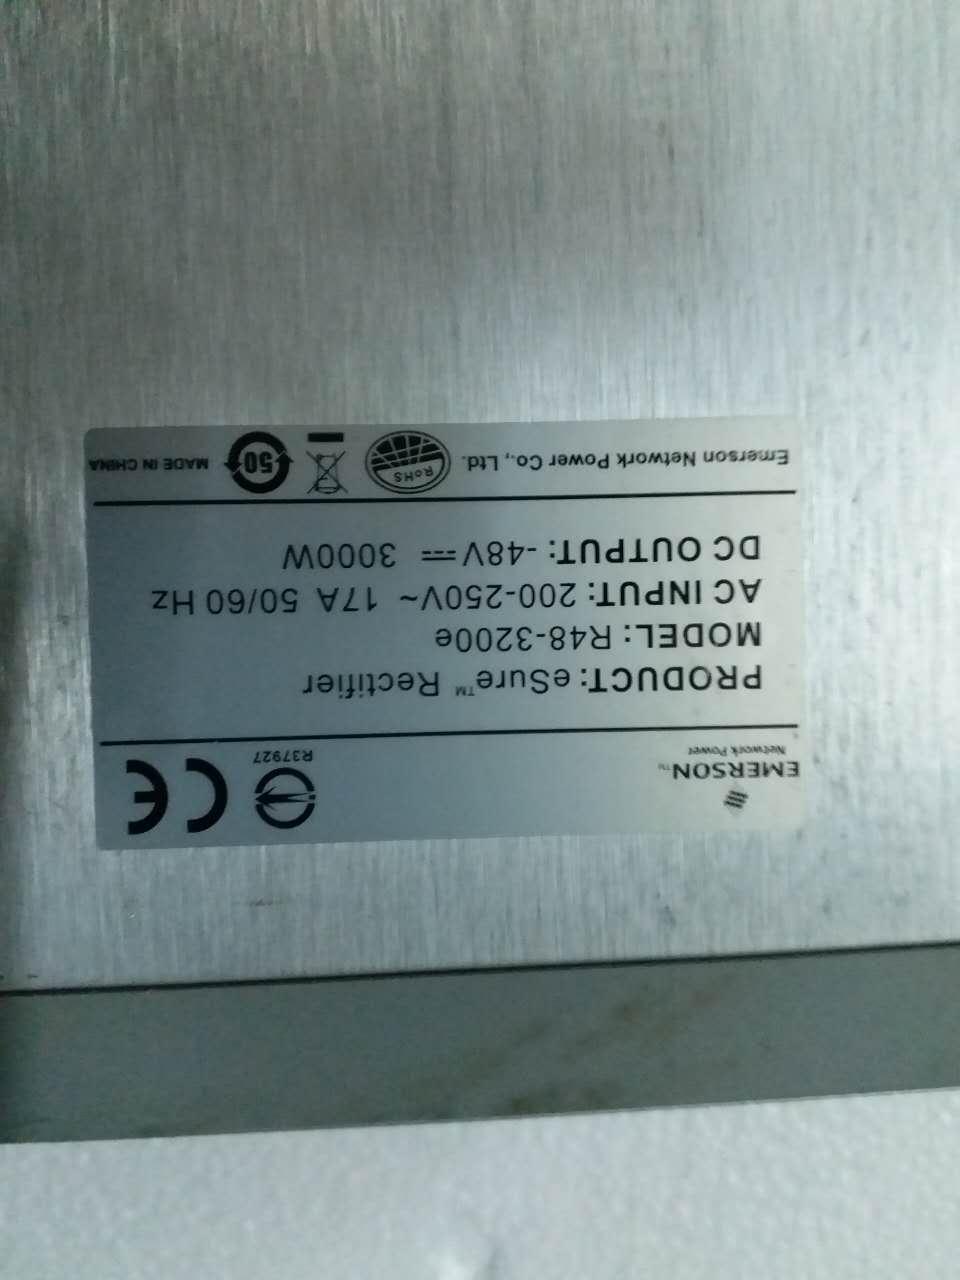 Emerson EMERSON3200E used high power module